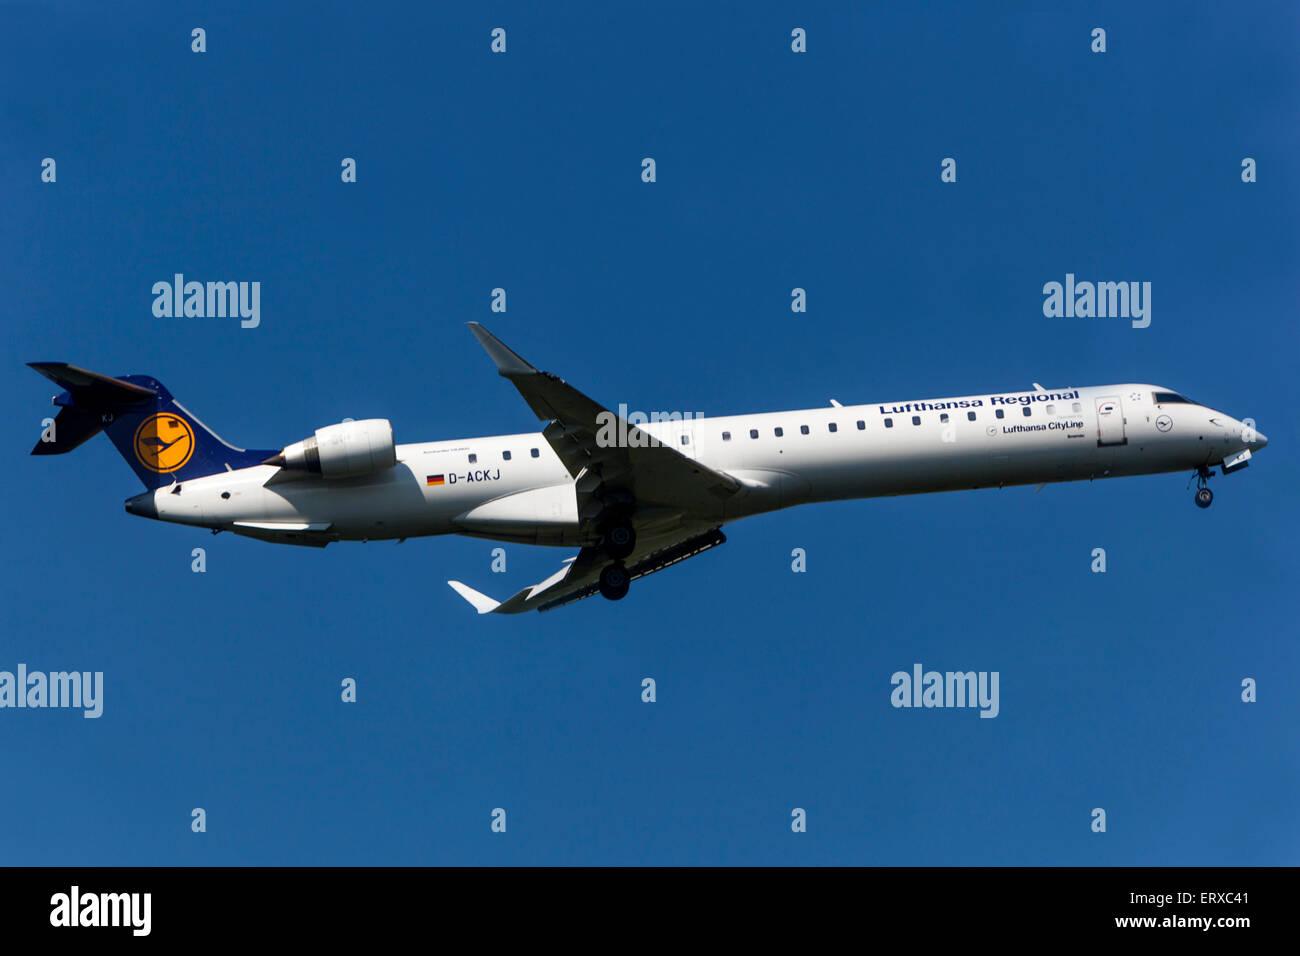 Canadair CRJ-900 operated by Lufthansa CityLine on approach for landing Prague, Czech Republic - Stock Image